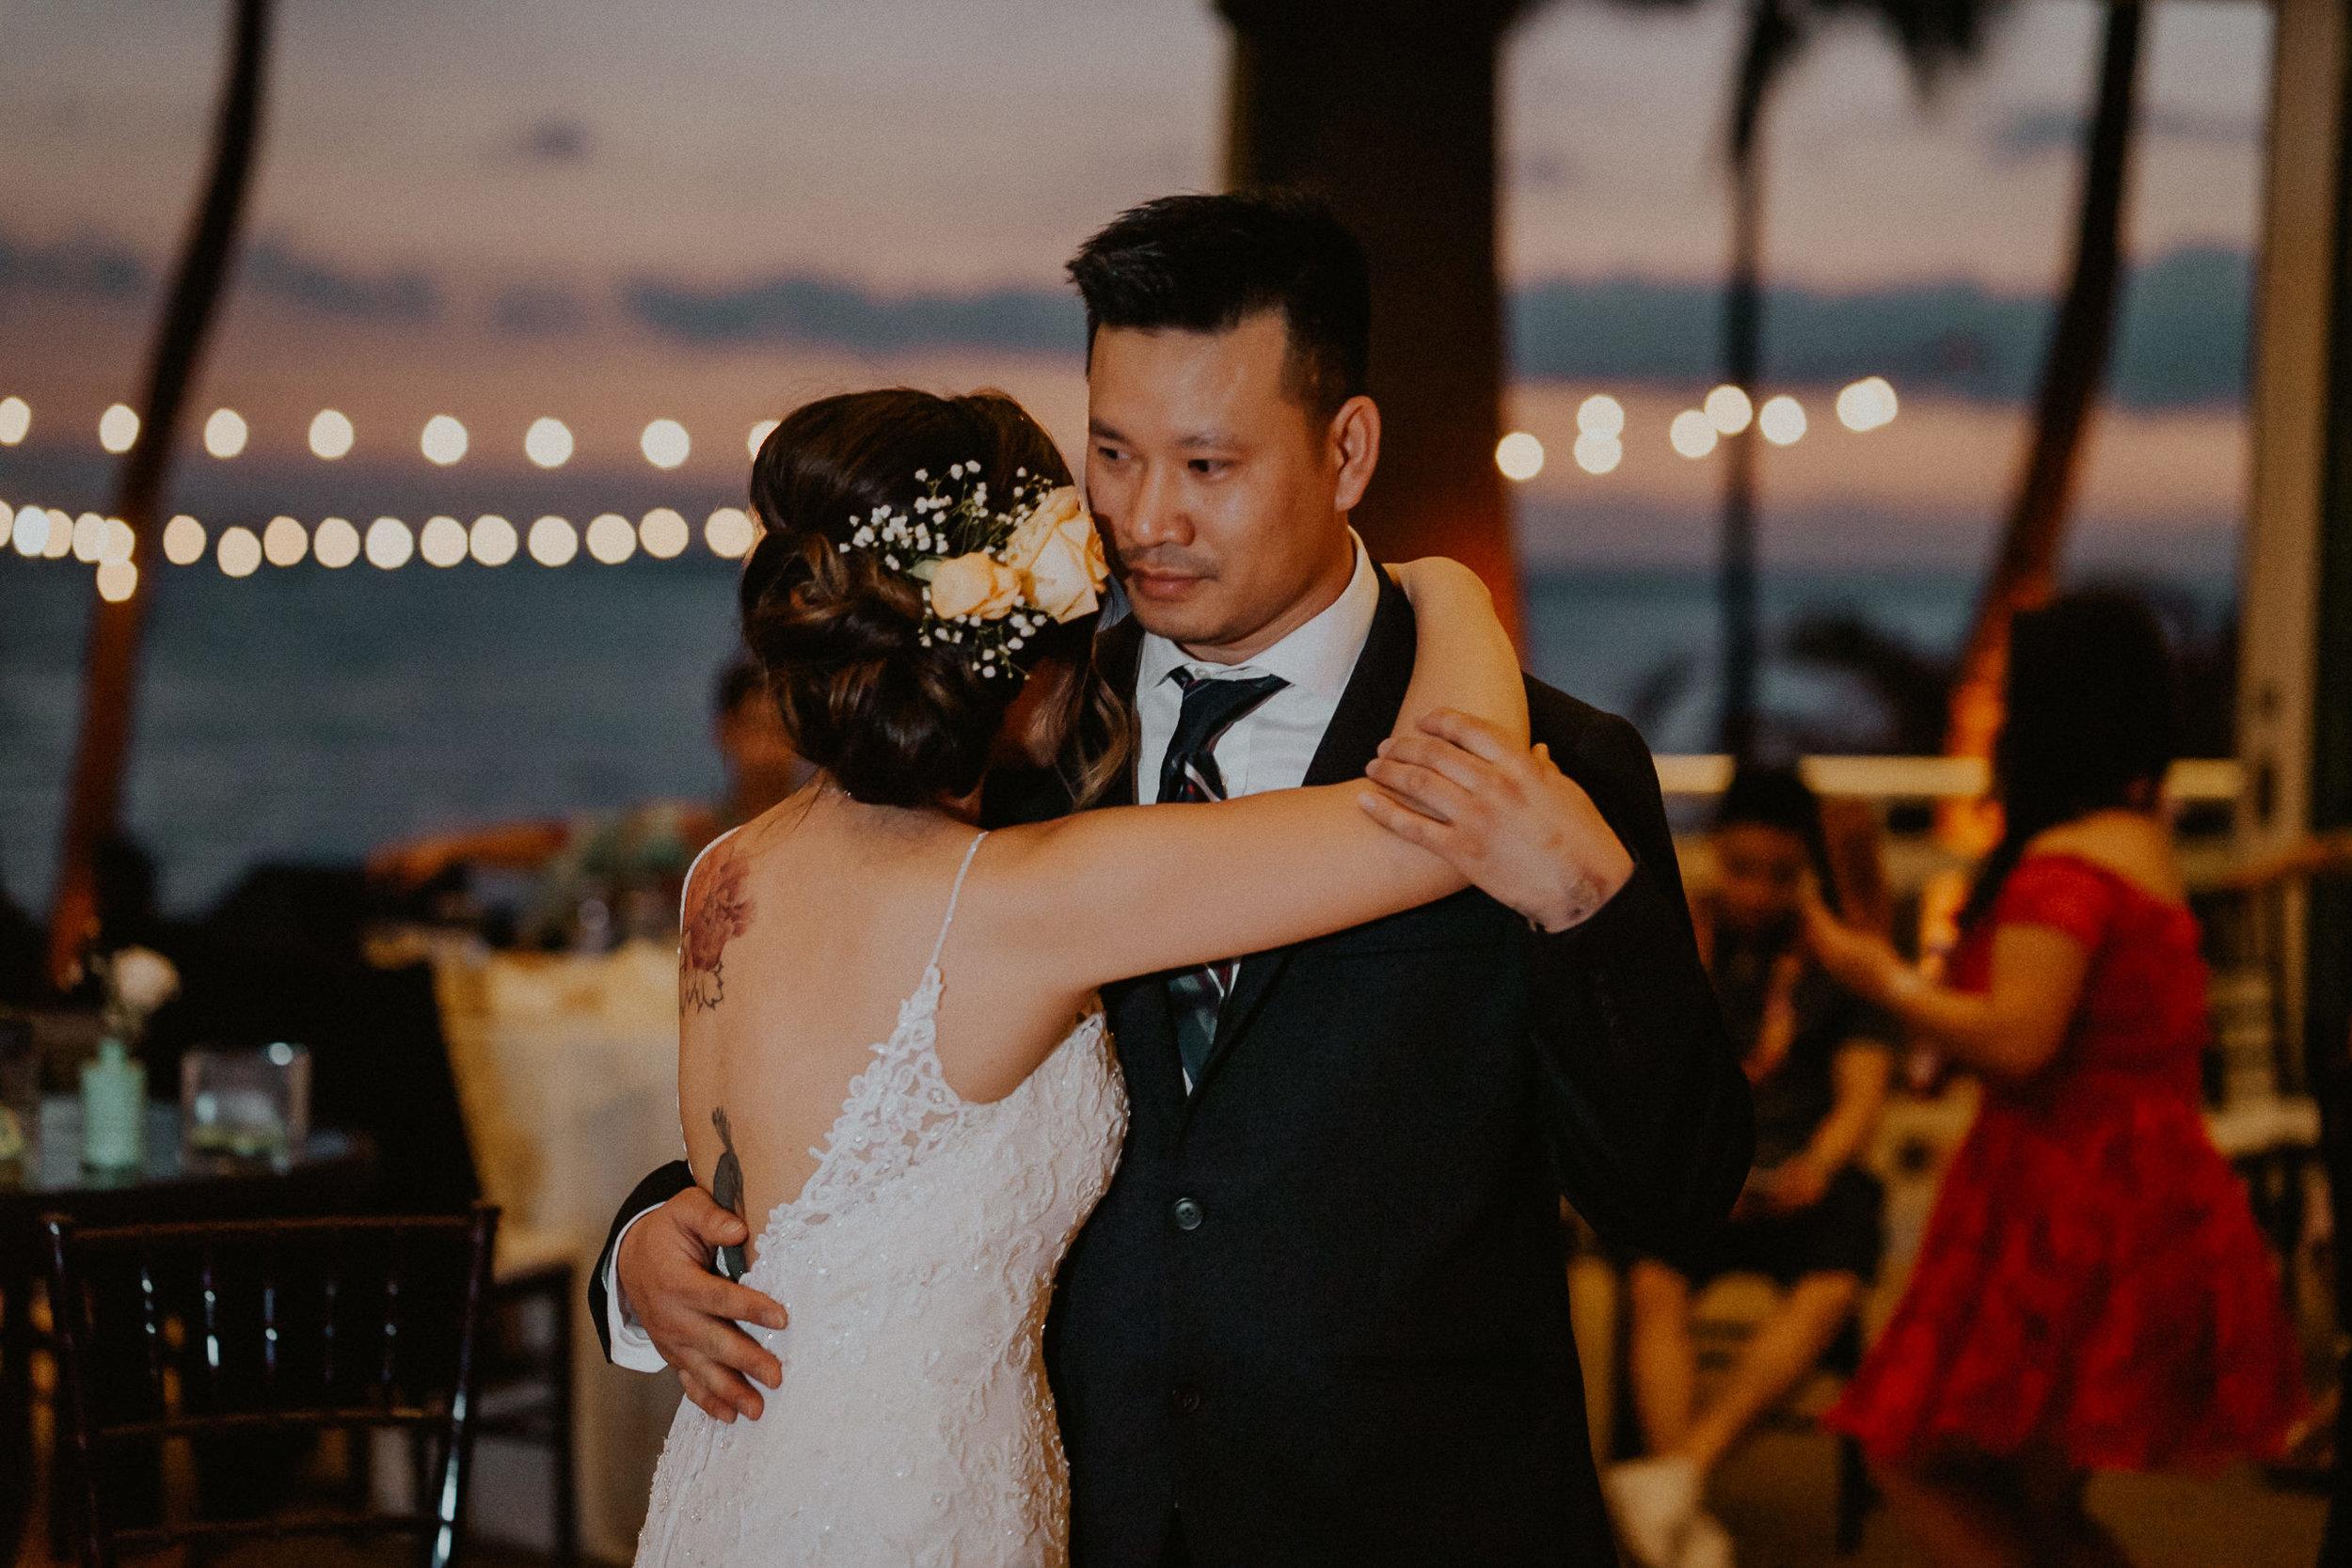 Maui_Destination_wedding_Alfred_Tang-73.jpg